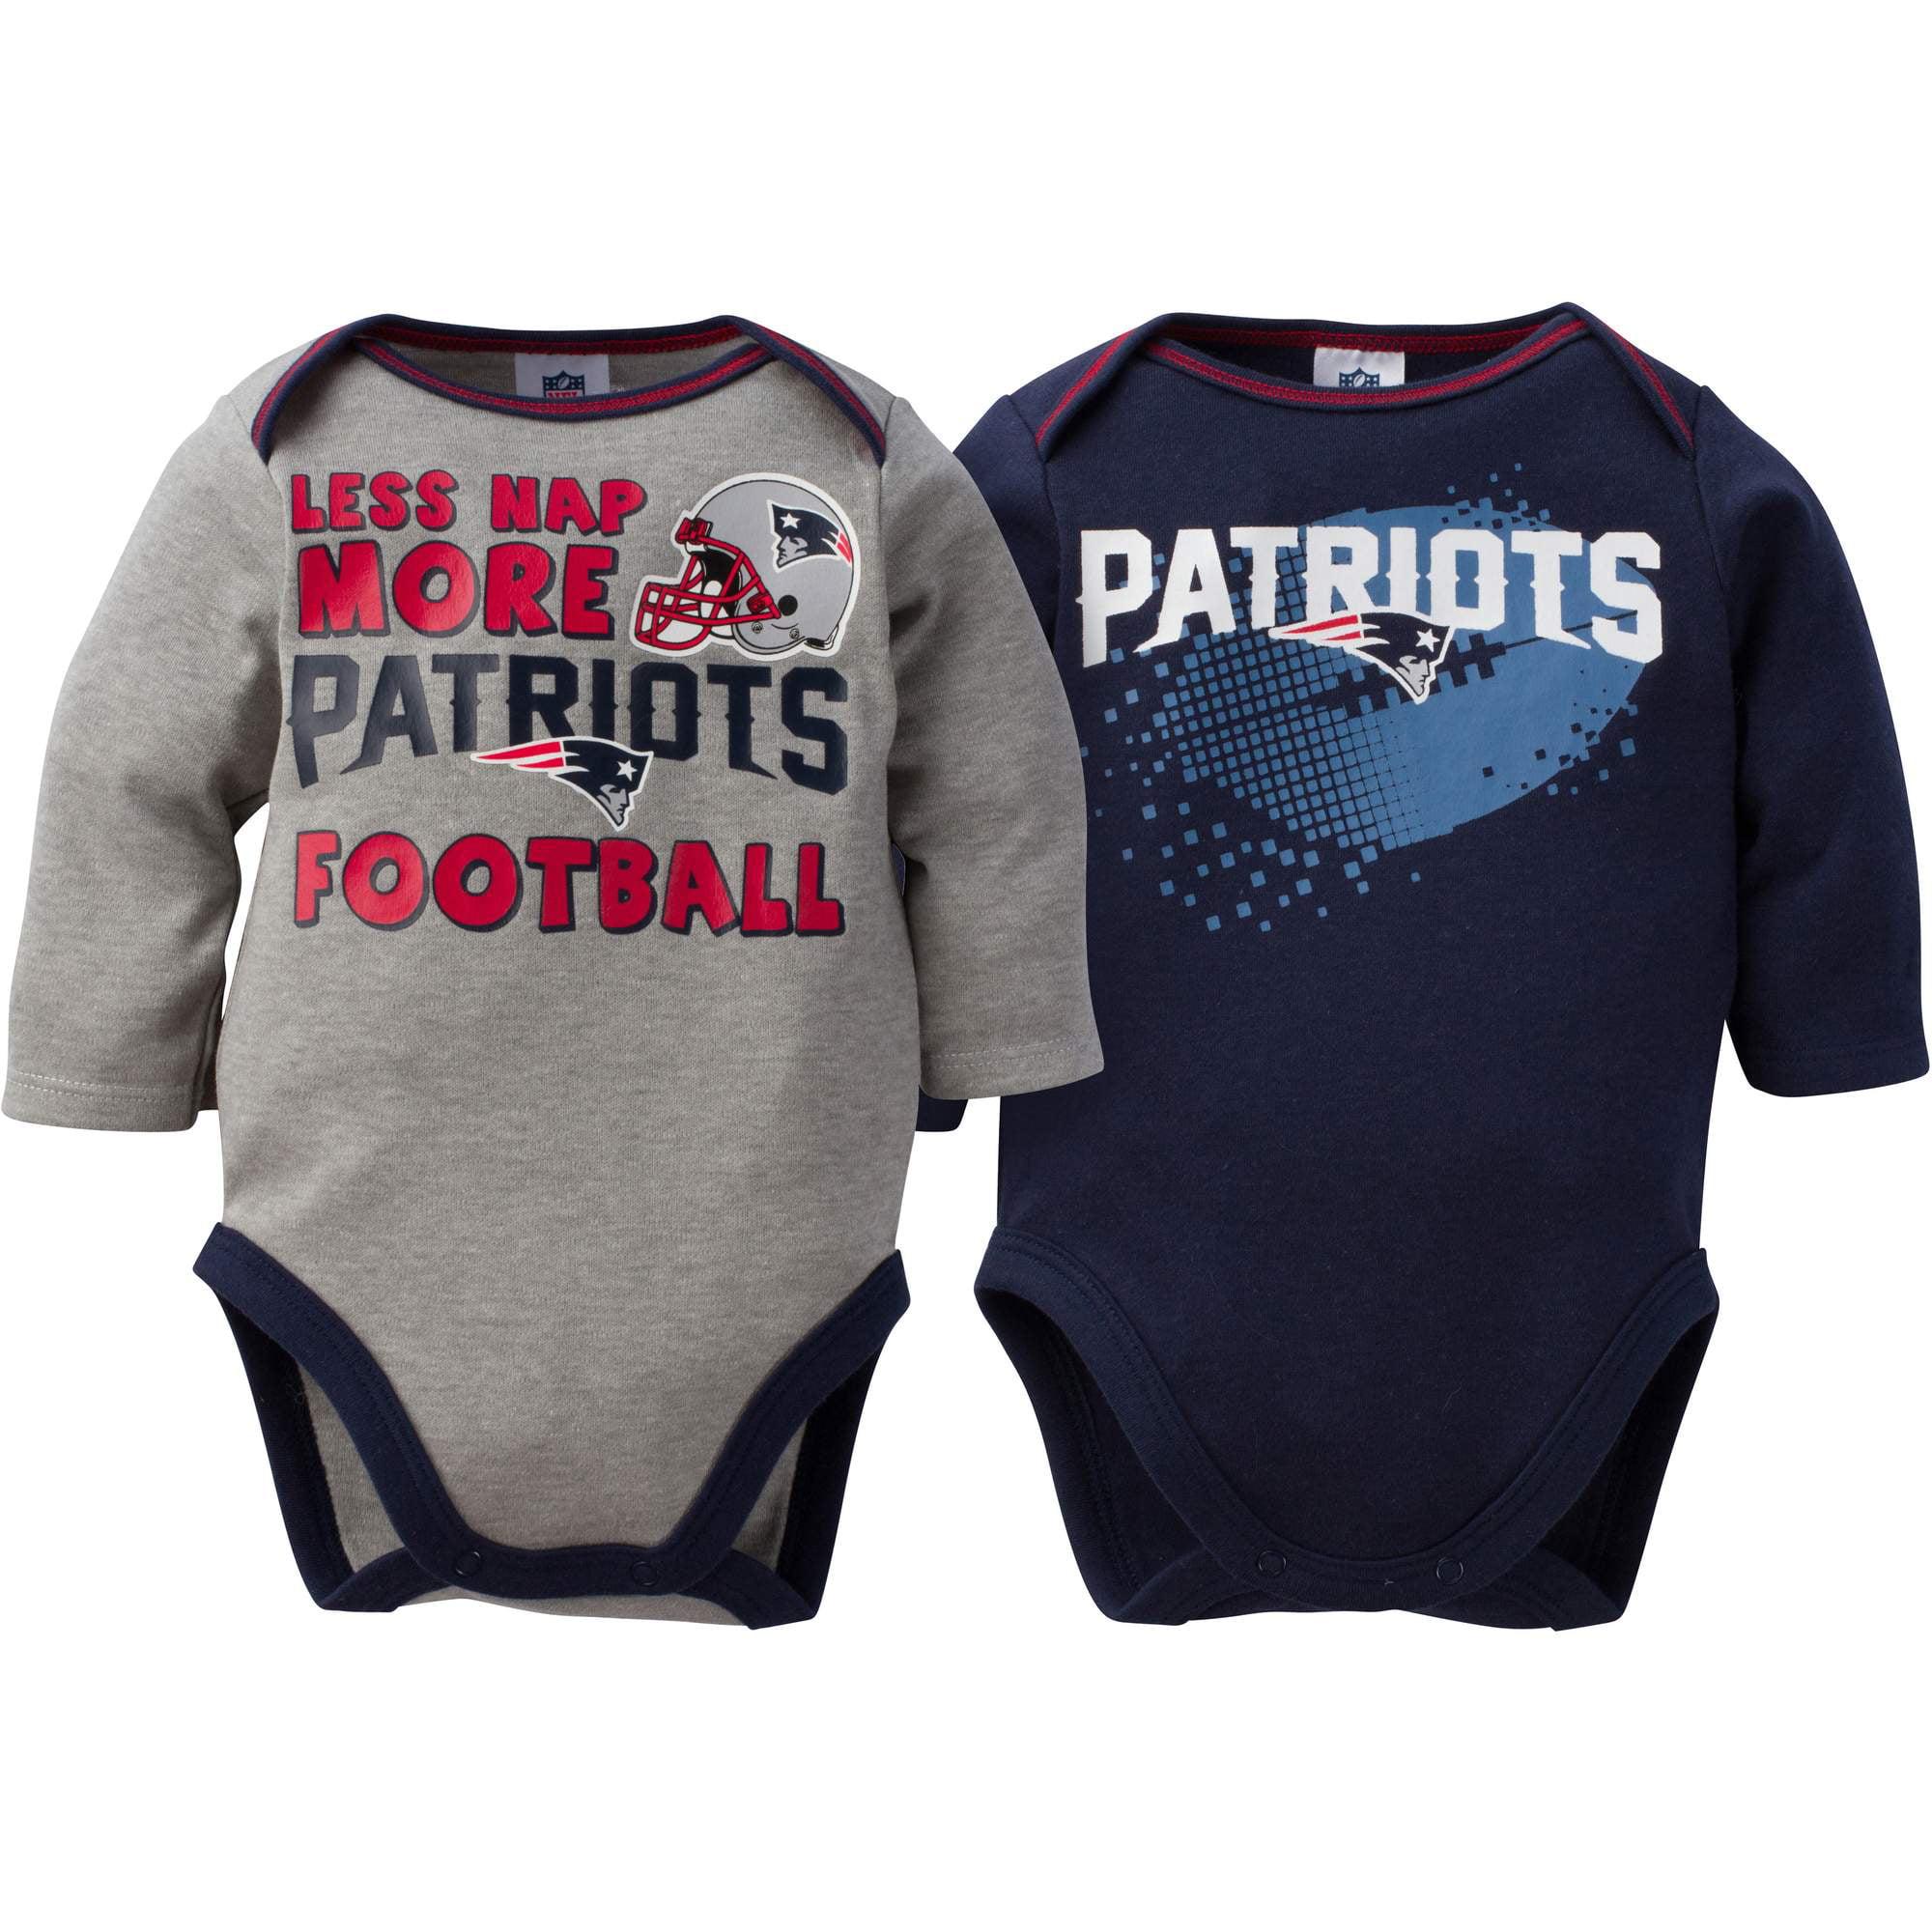 NFL New England Patriots Baby Boys Long Sleeve Bodysuit Set, 2-Pack